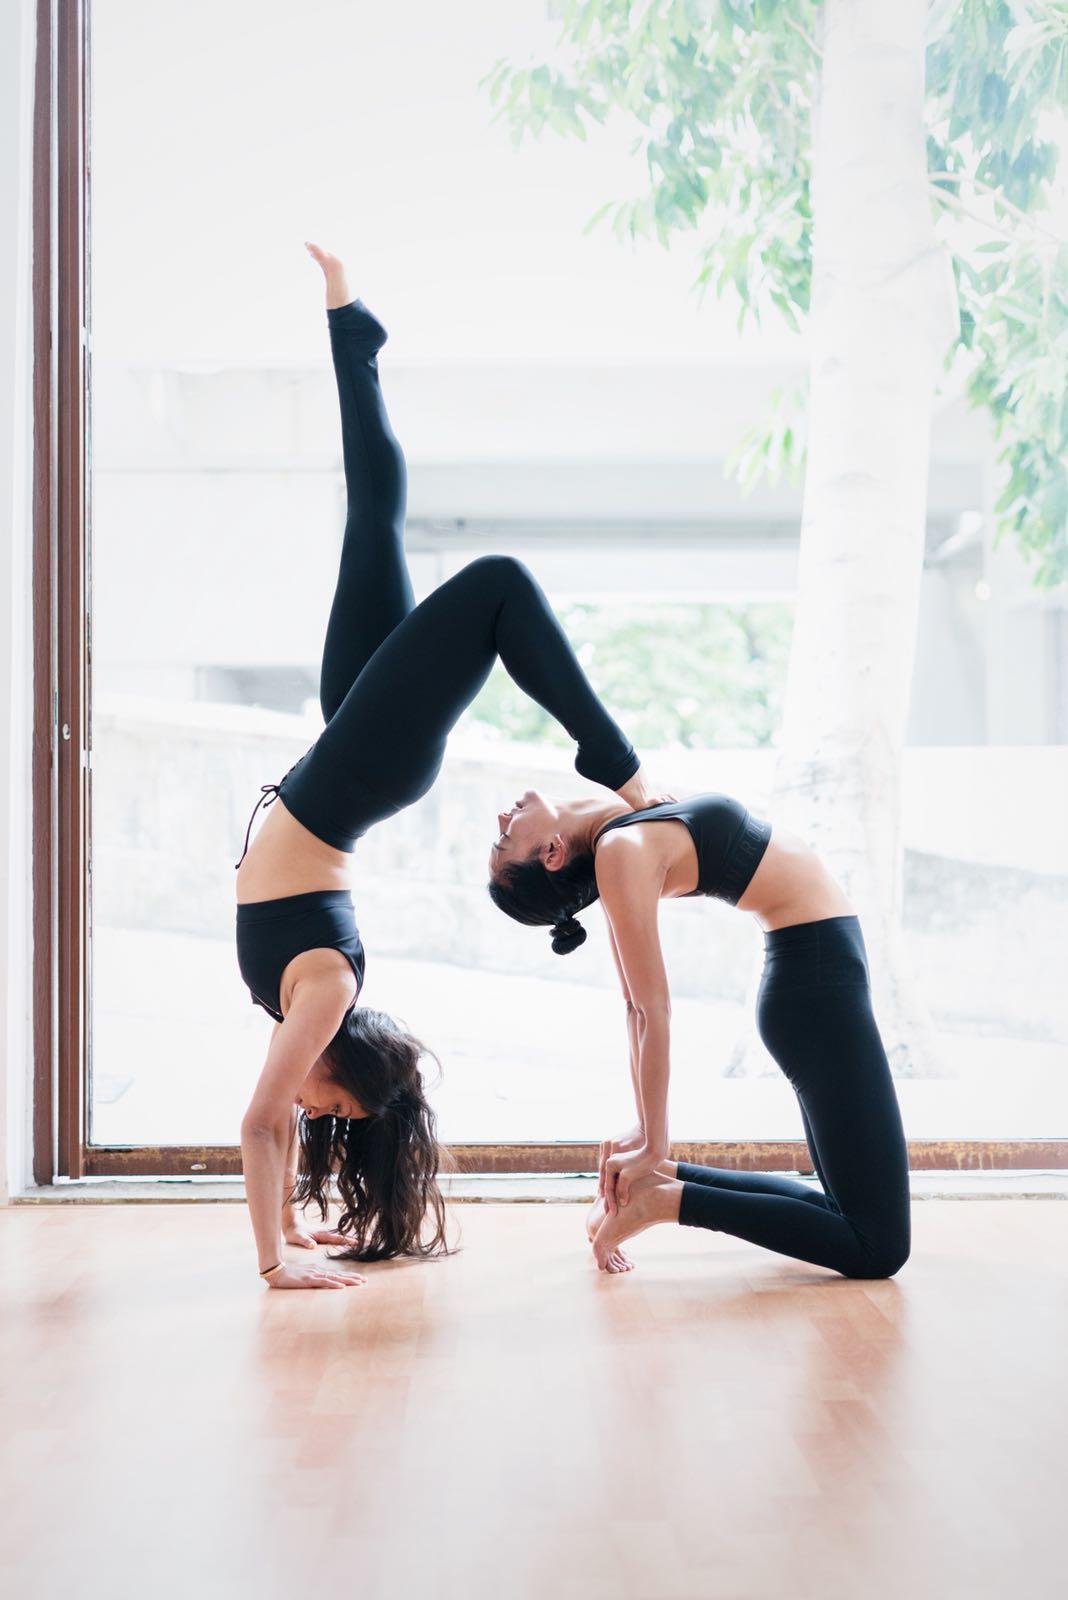 Dyamic Yoga Workshop & K11 Natural Refreshments Tour - WELLNESS - K11